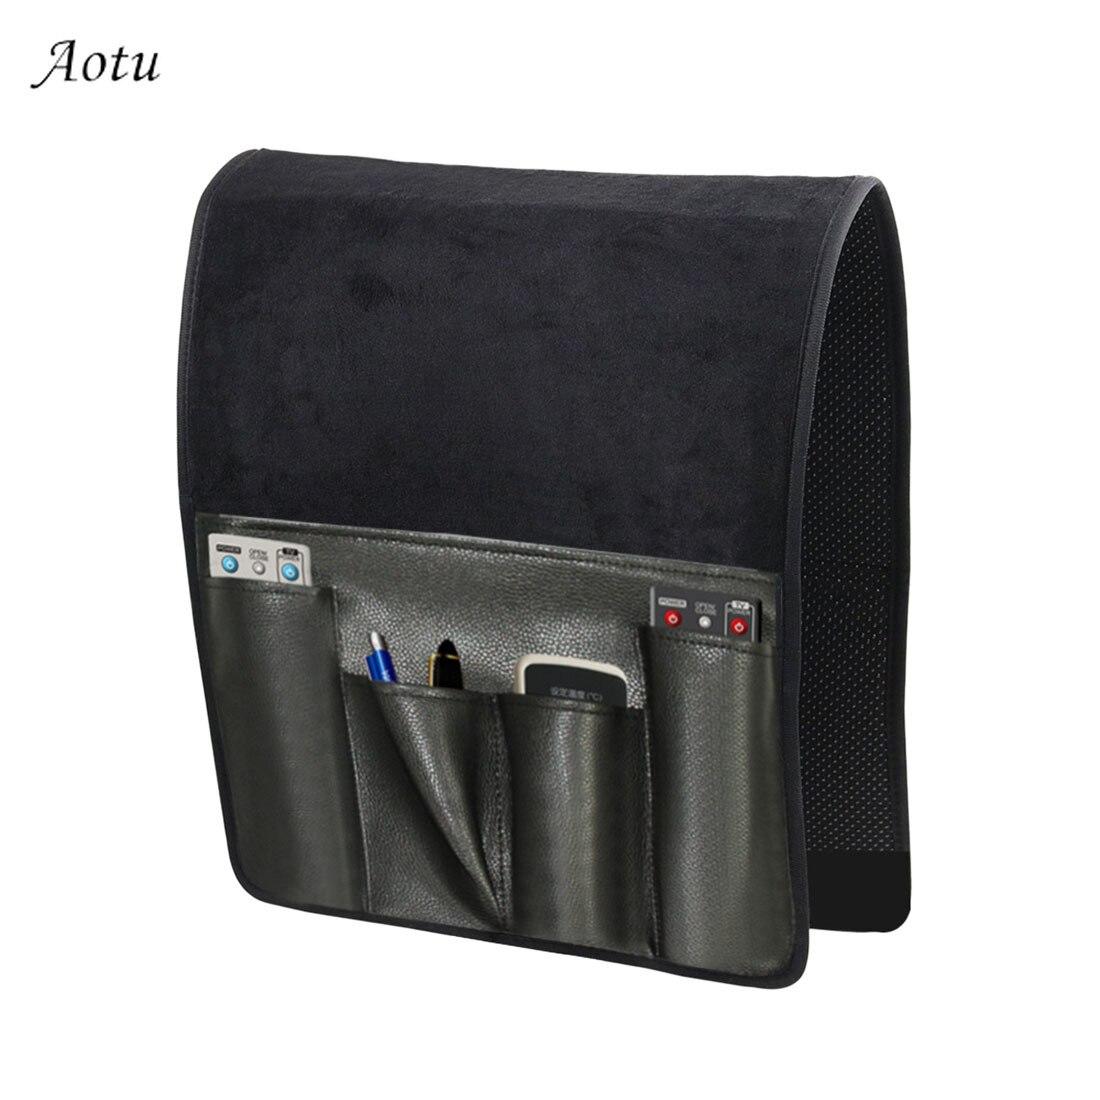 6 Pocket Sofa Couch Arm Rest Organizer Sofa Storage Bag